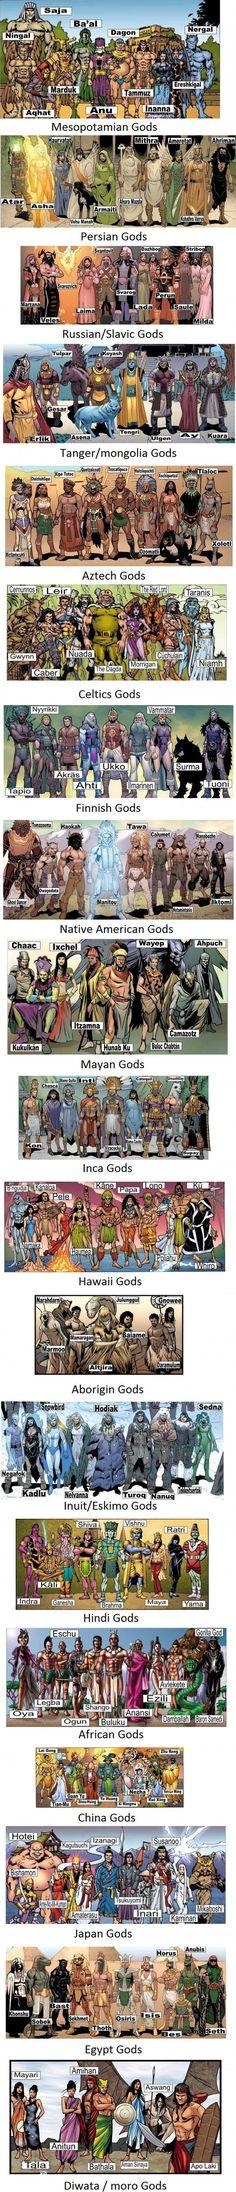 dieux deesse dessin peuple